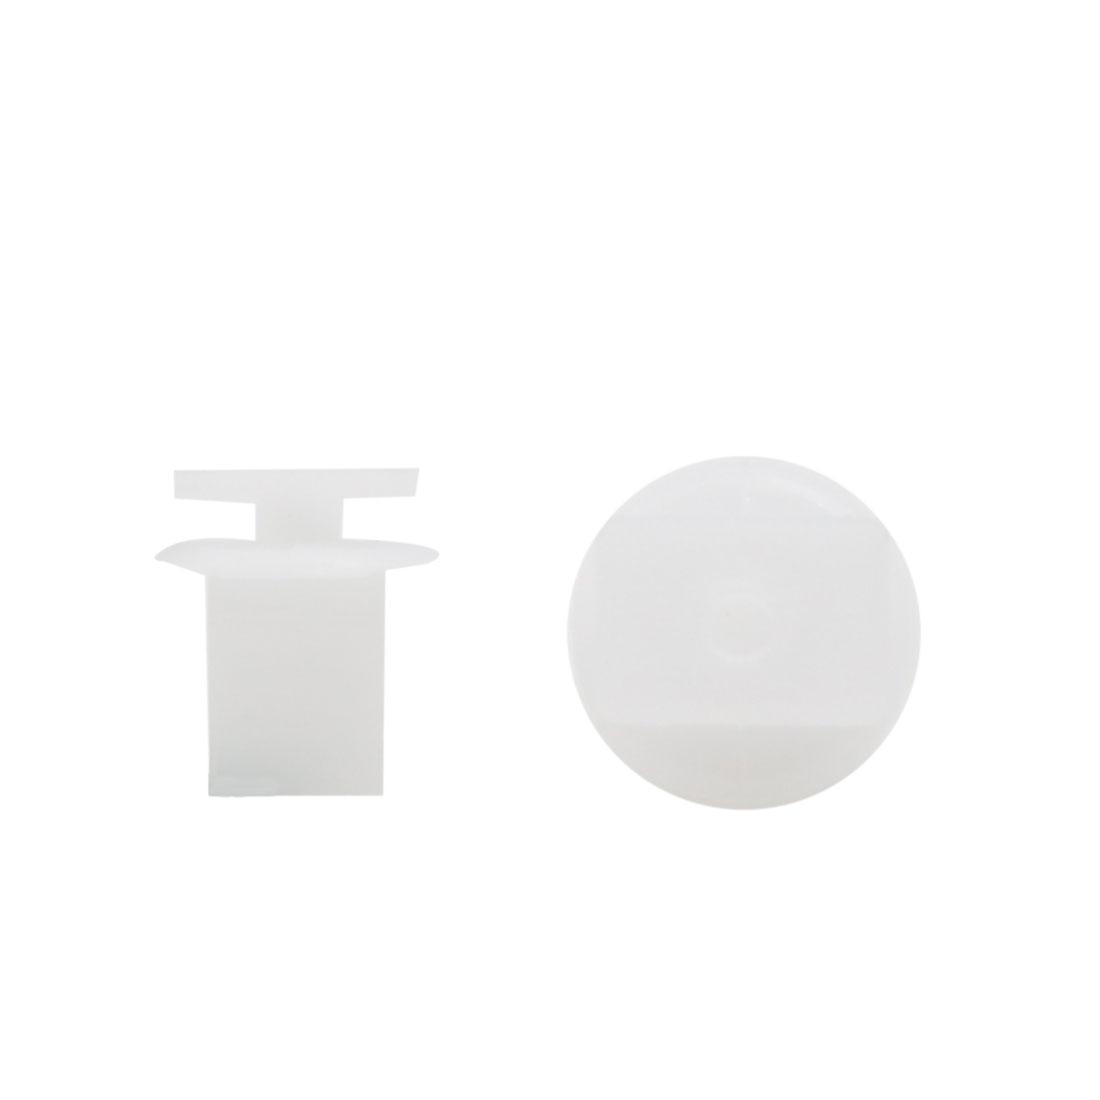 50pcs 8mm Hole White Plastic Rivets Car Push in Type Bumper Retainer Clips